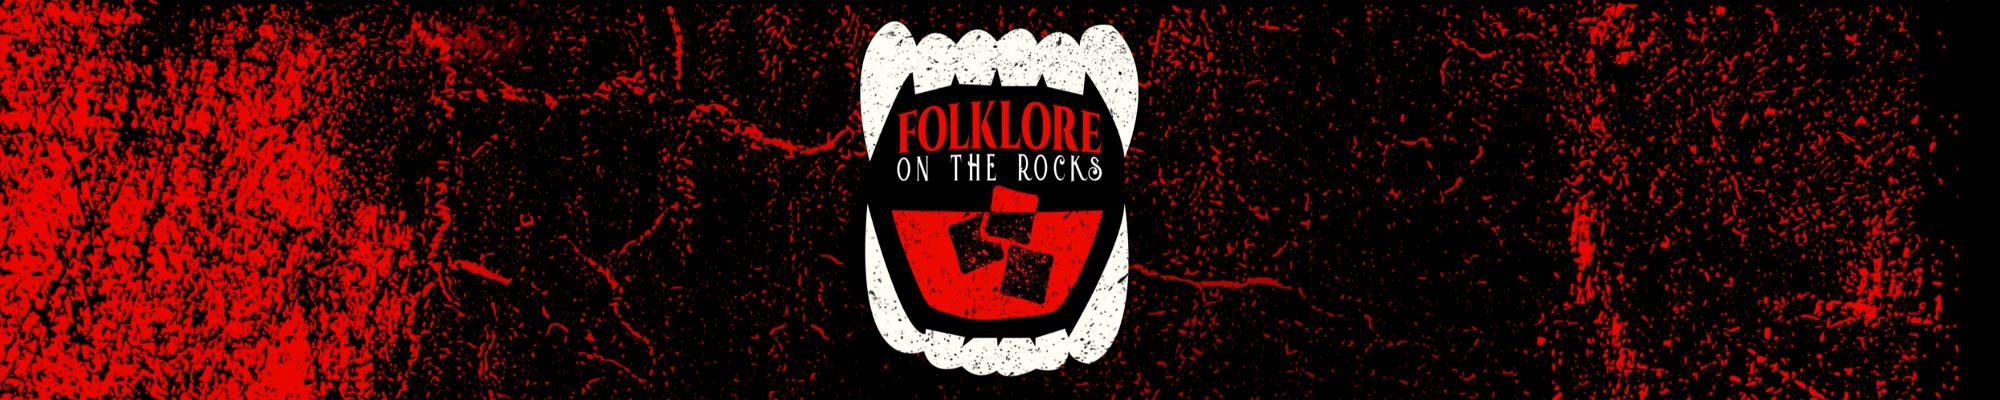 folkloreontherocks Cover